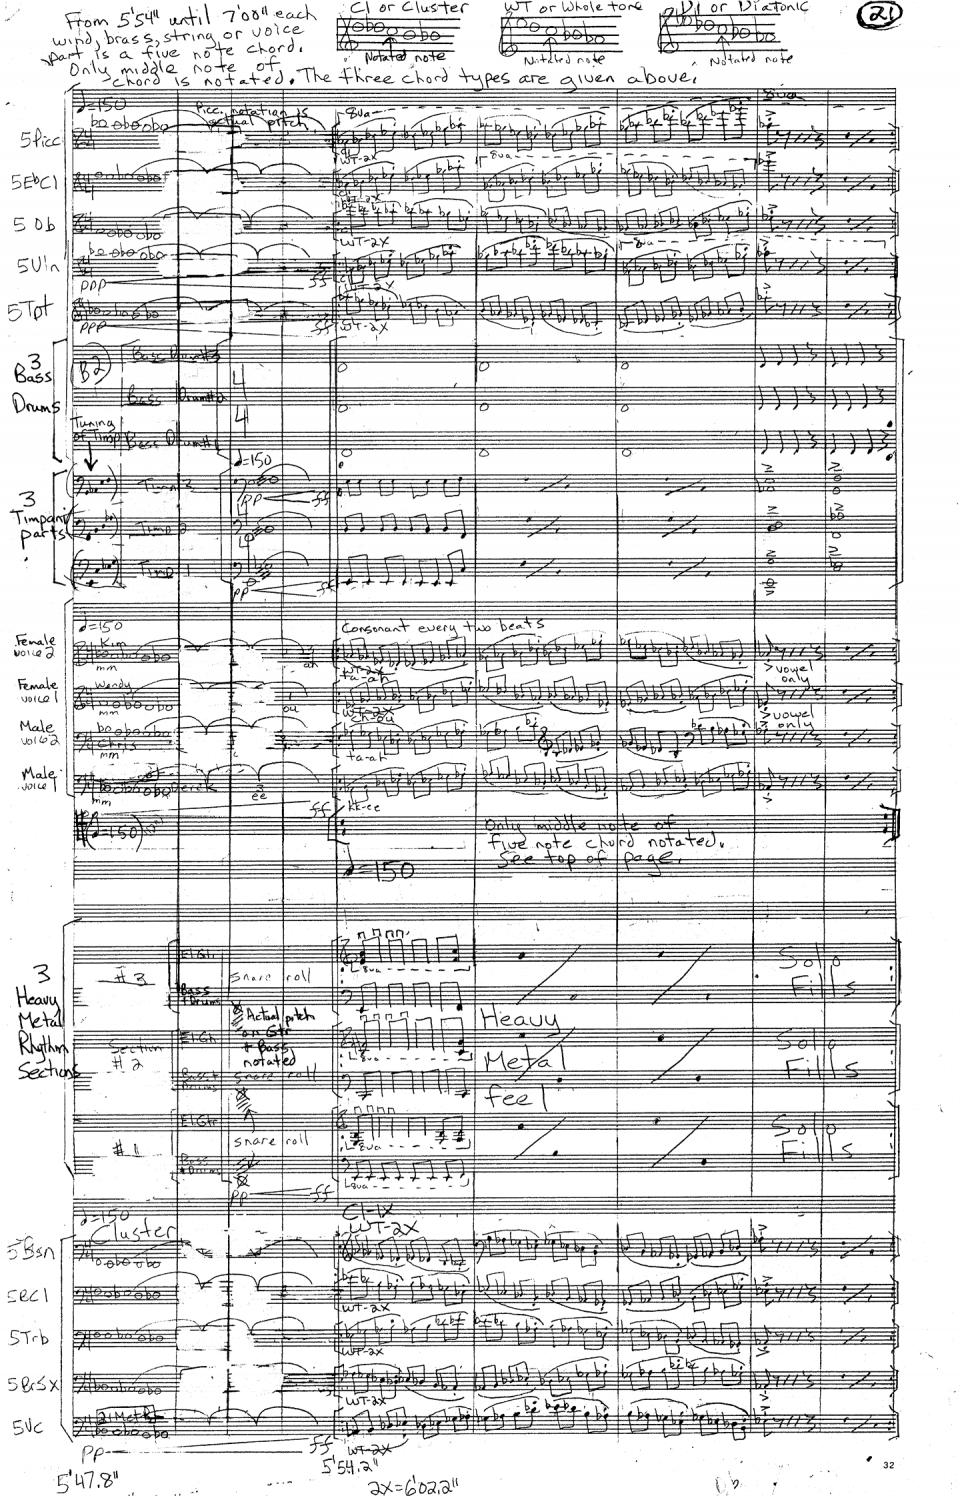 page 25B